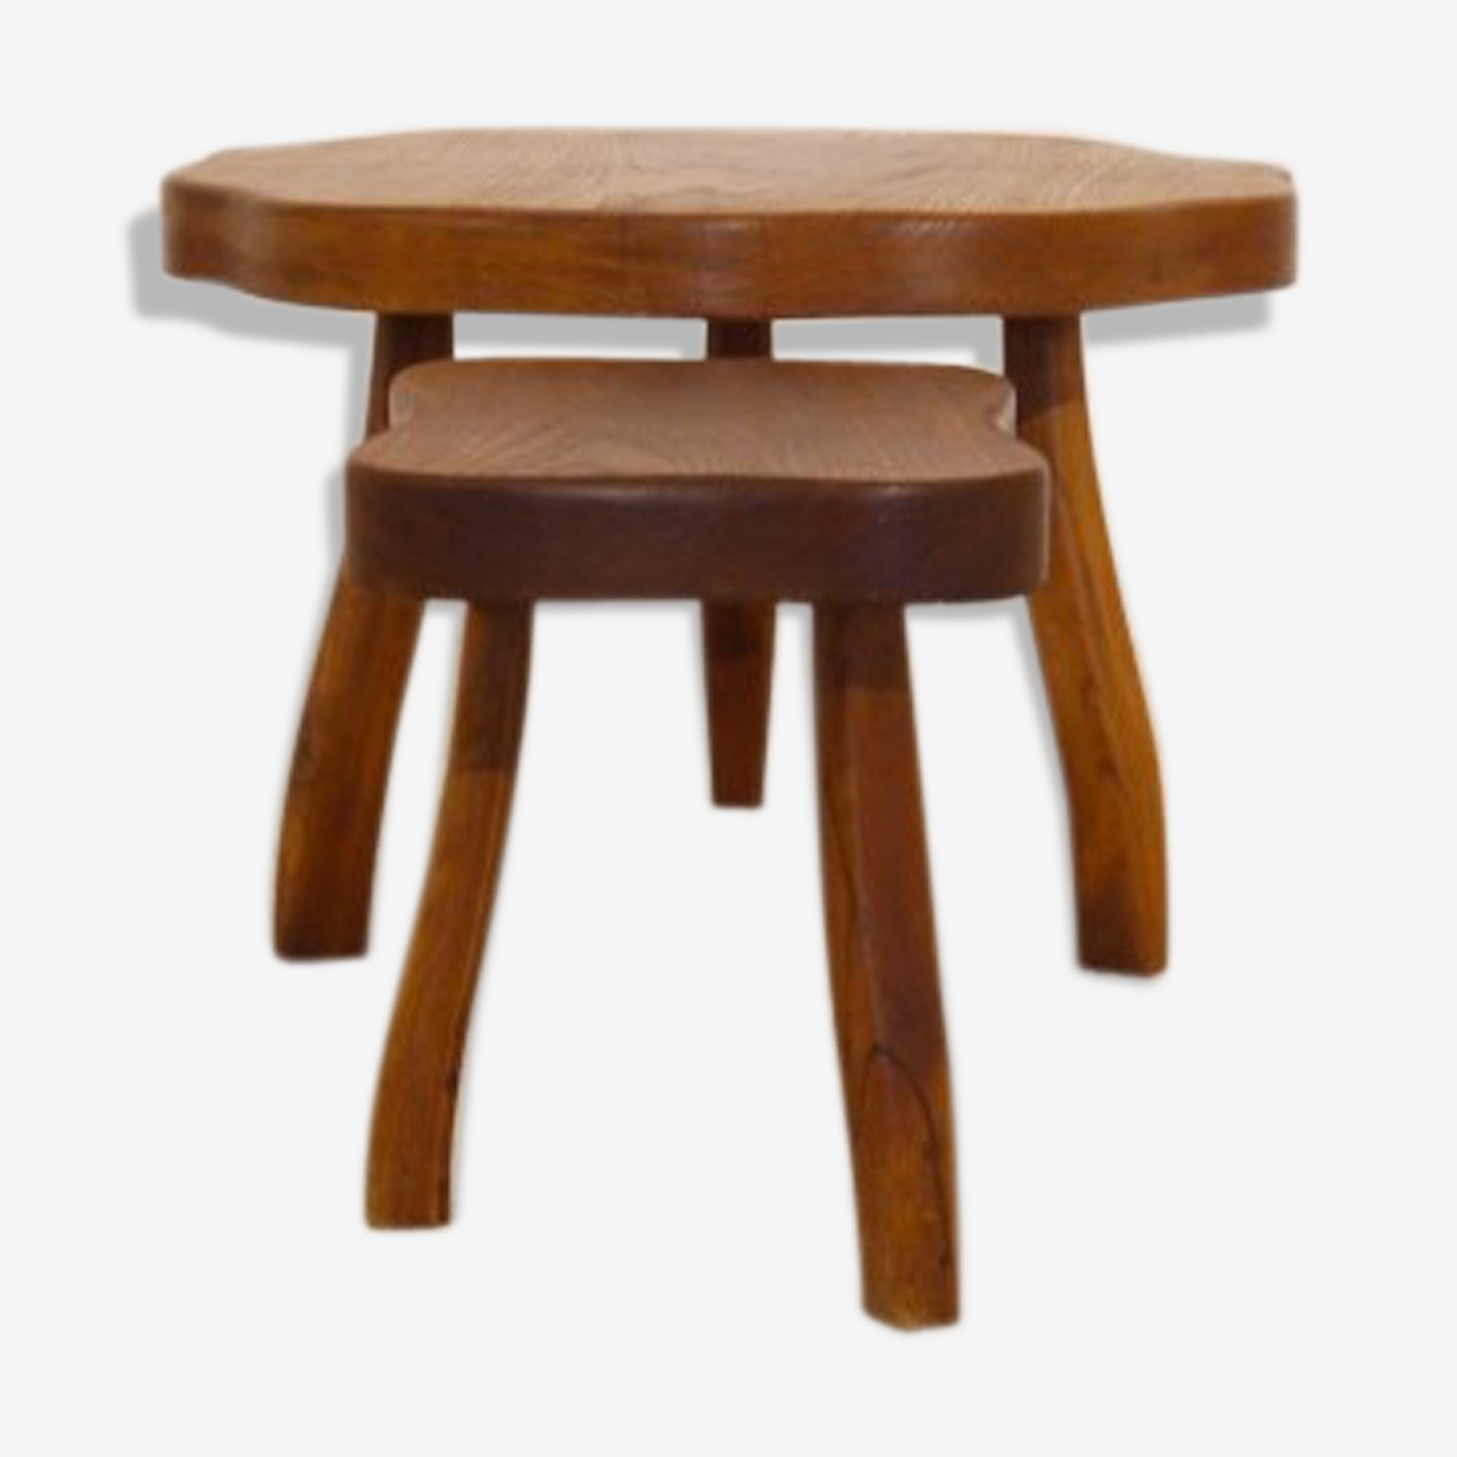 Set de tables basses tripode design brutalist